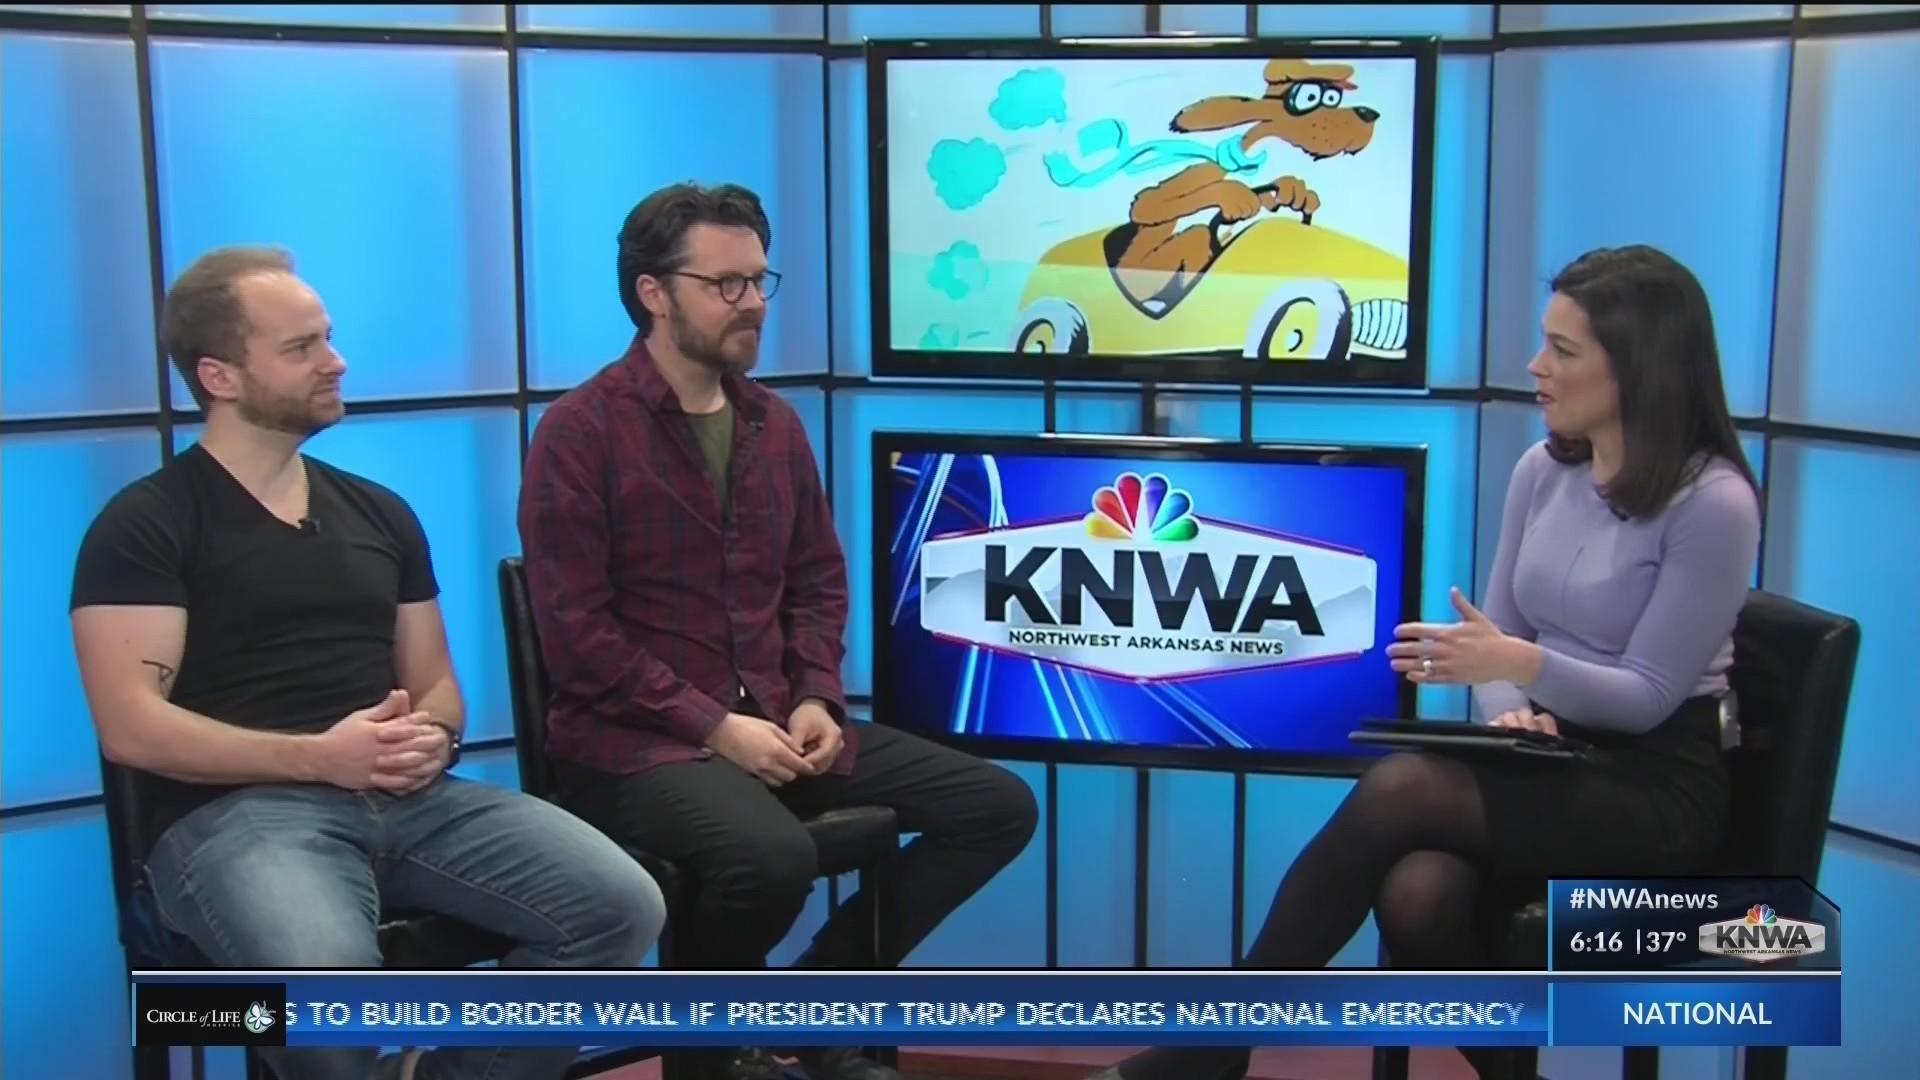 KNWA_Today___Go__Dog__Go___at_Walton_Art_0_20190111122511